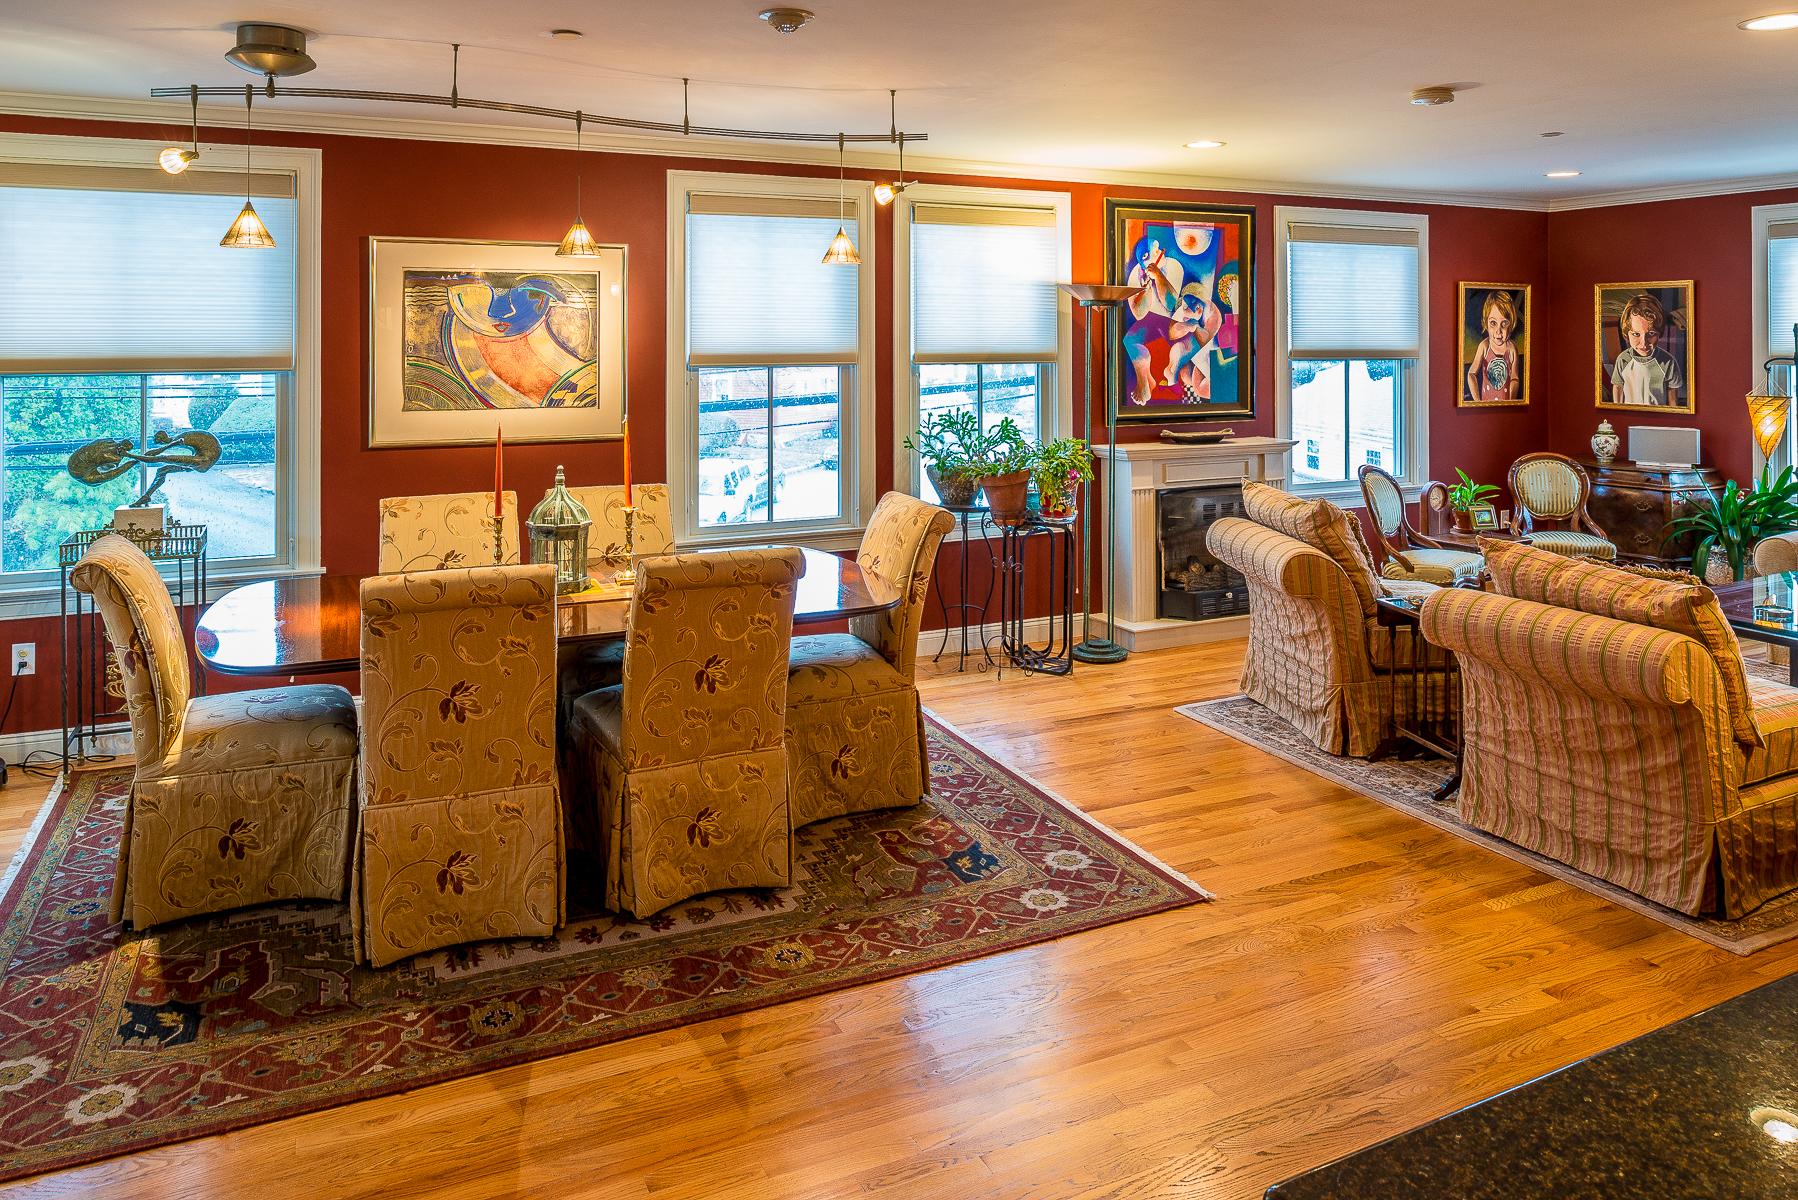 Condomínio para Venda às In Town Luxury 18 Prospect Street Unit 1 Marblehead, Massachusetts, 01945 Estados Unidos